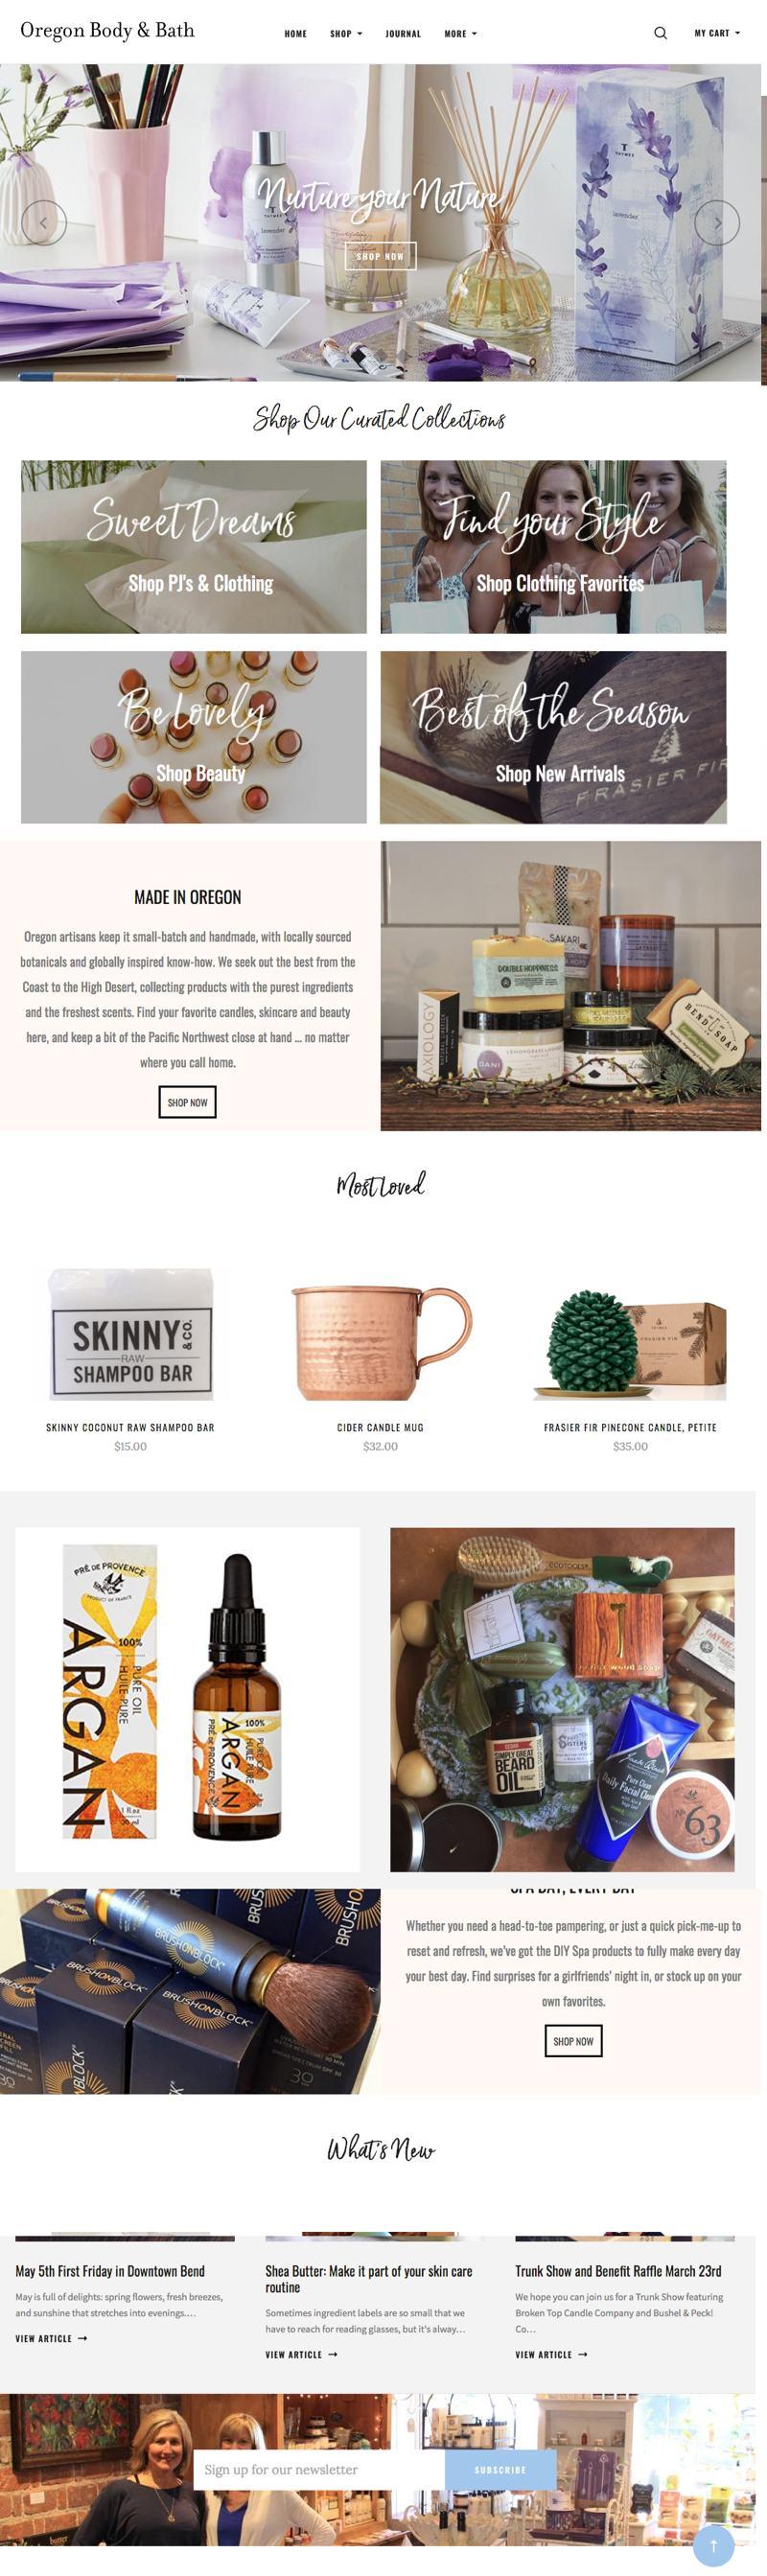 Oregon Body and Bath -  Homepage